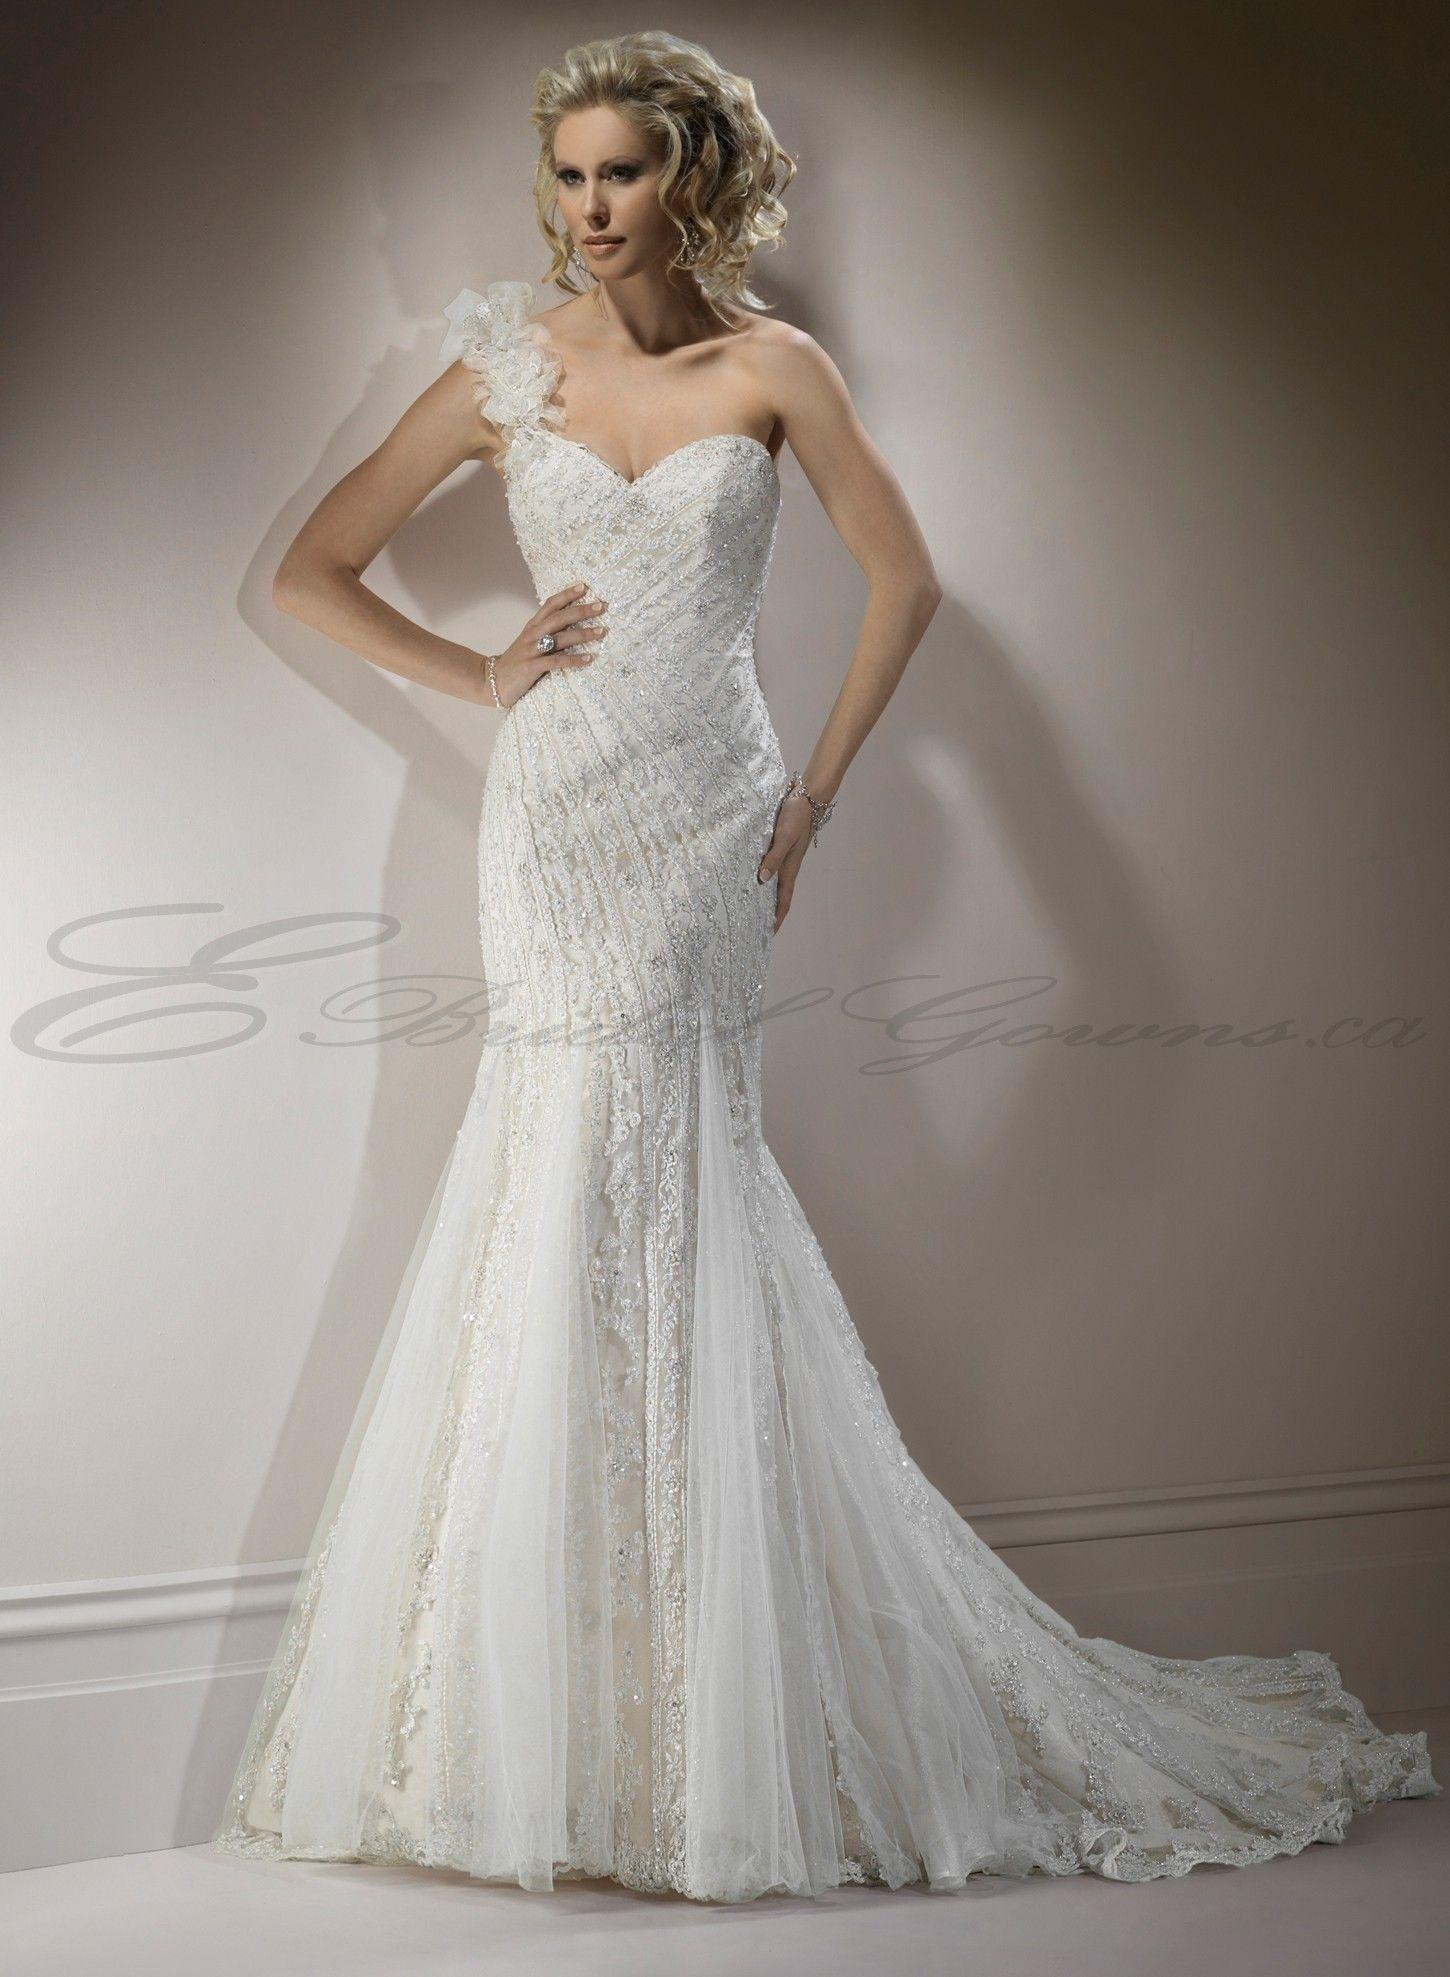 sweetheart mermaid wedding dresses Mermaid Wedding Gowns Lace Mermaid Sweetheart Neckline Fit and Flare Wedding Dress Canada